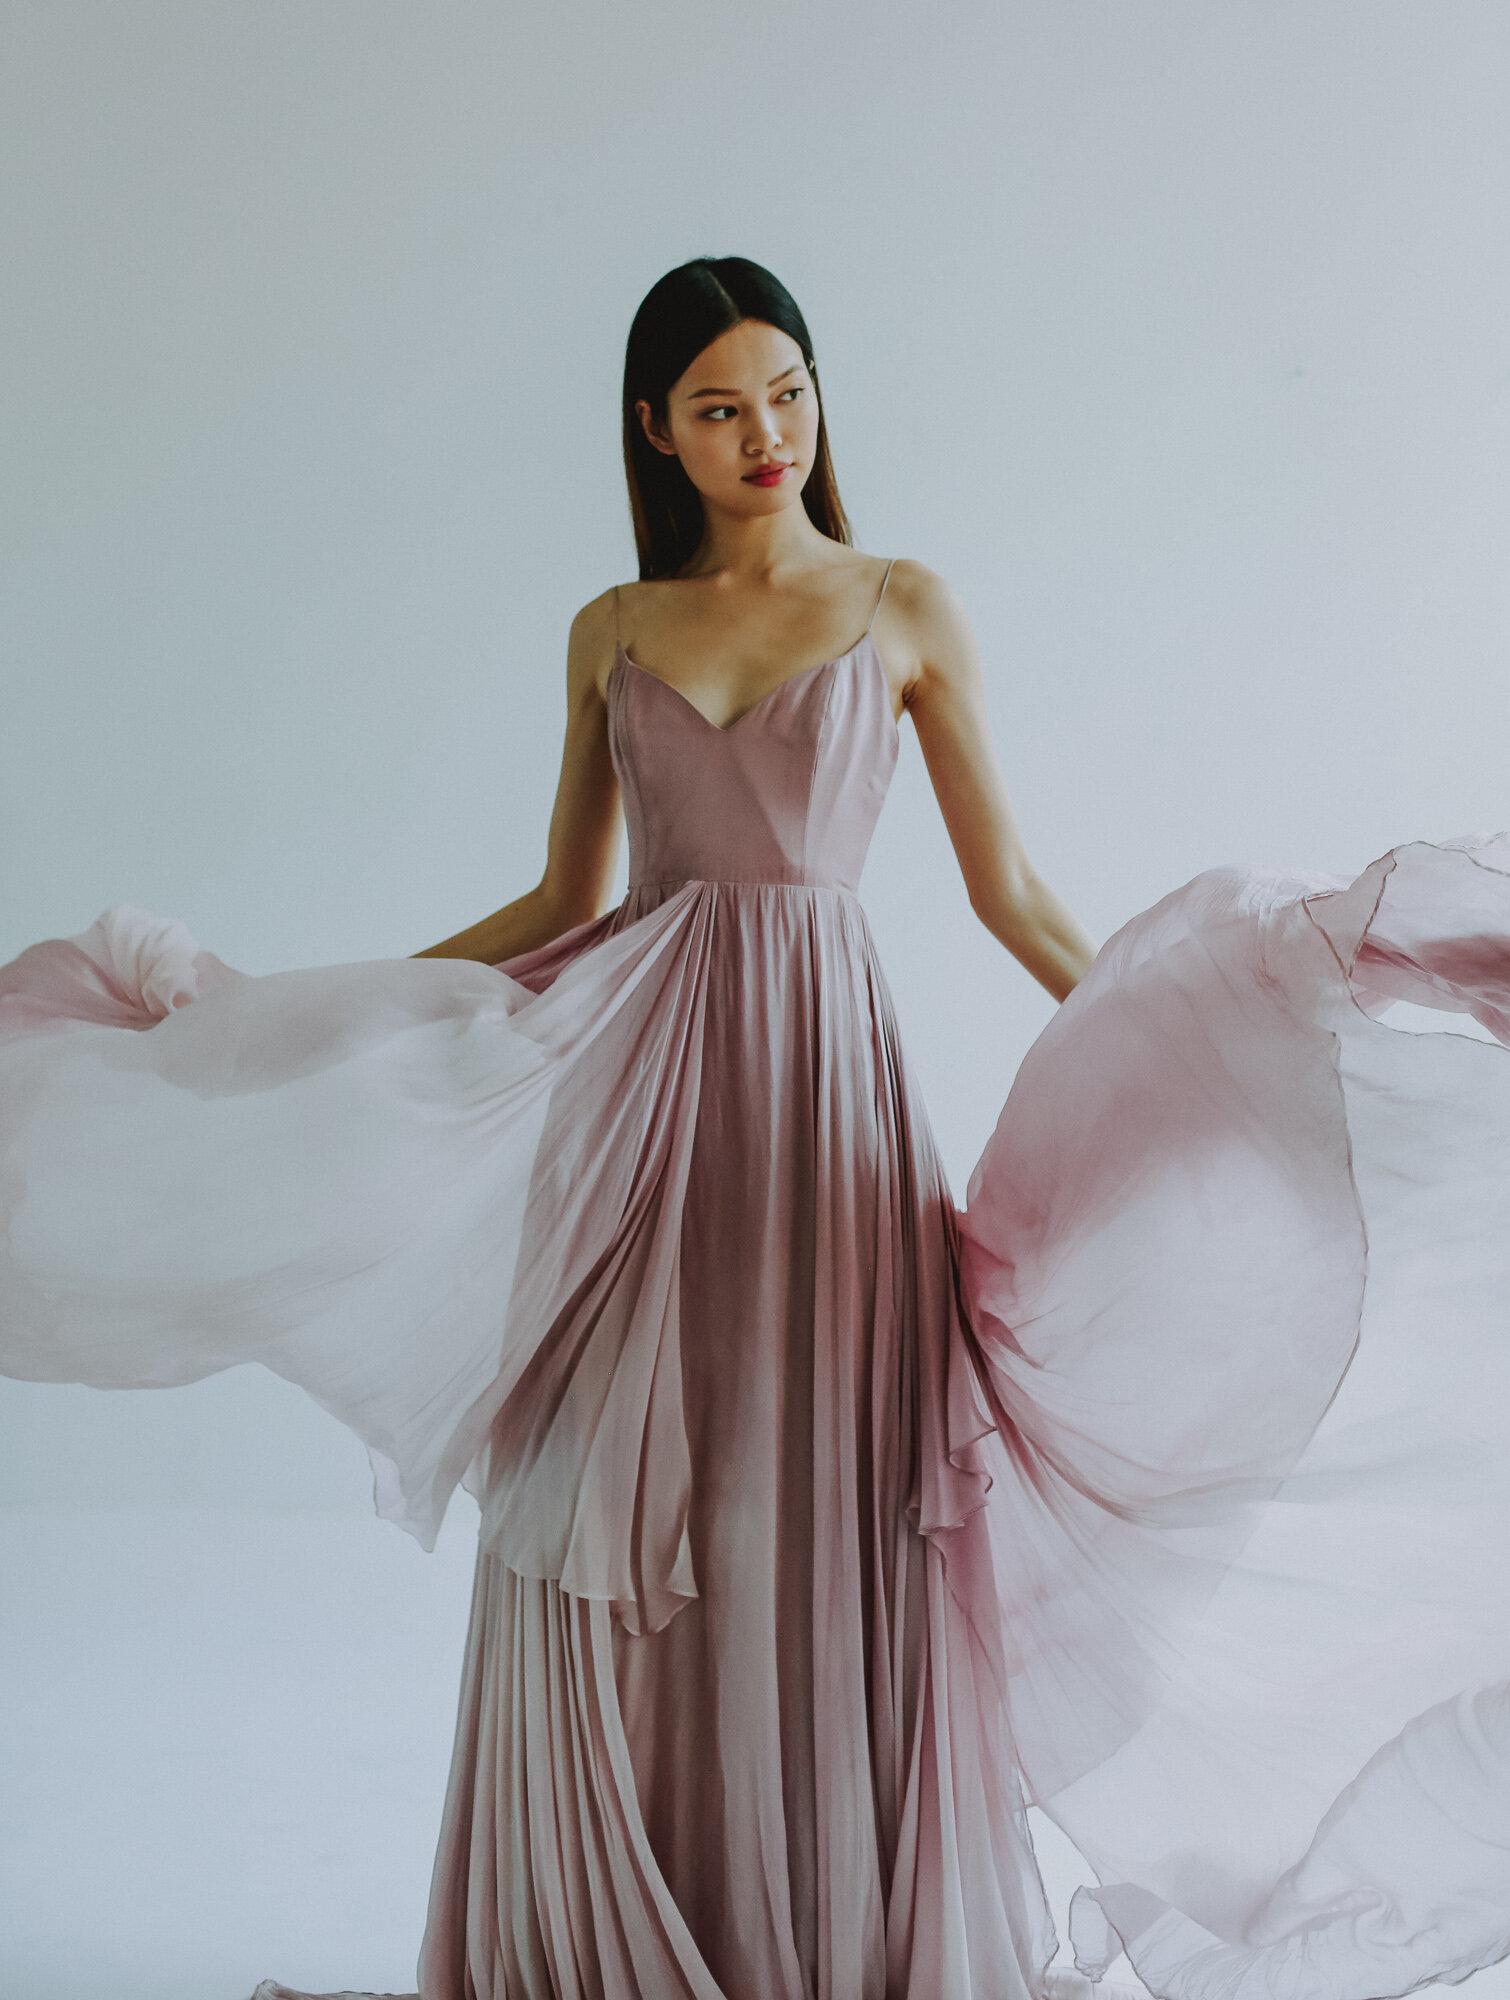 Dye Wedding Dress Transform Your Wedding Gown Leanne Marshall,Wholesale Cheap Wedding Dresses